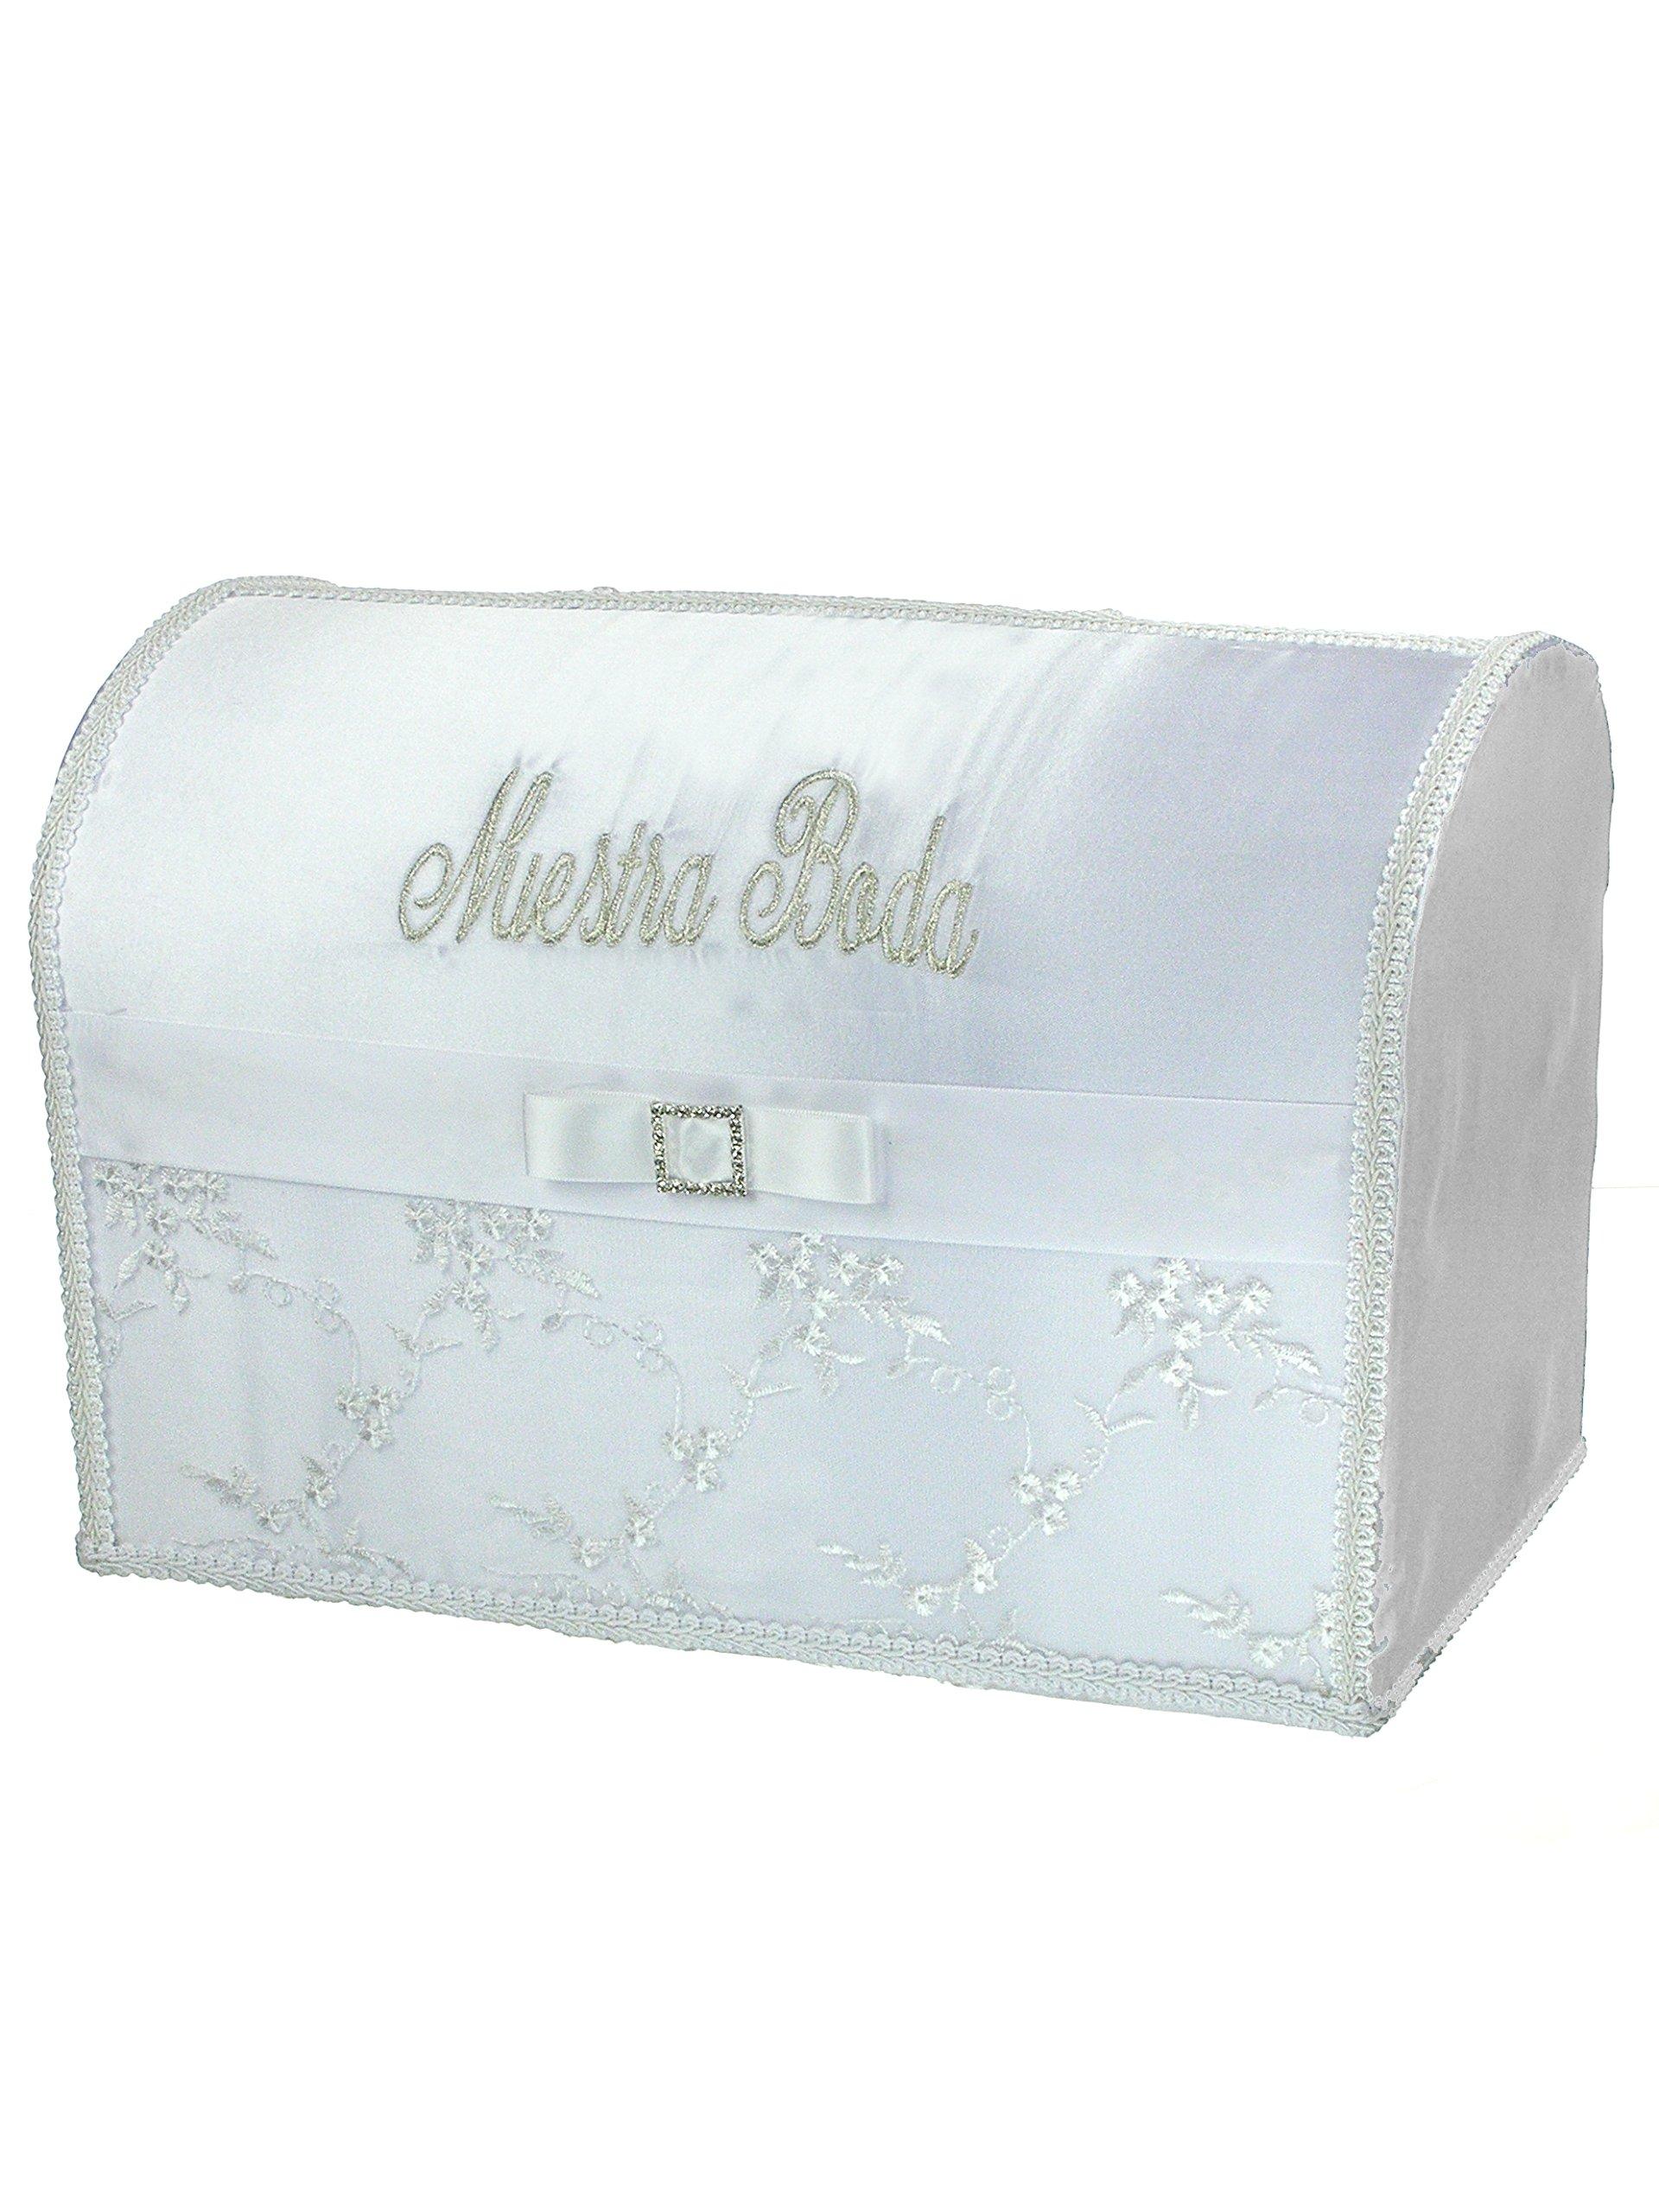 Spanish Style Spanish Embroidered Wedding Gift Card/Money Box 15 x 10 x 9 Inches White